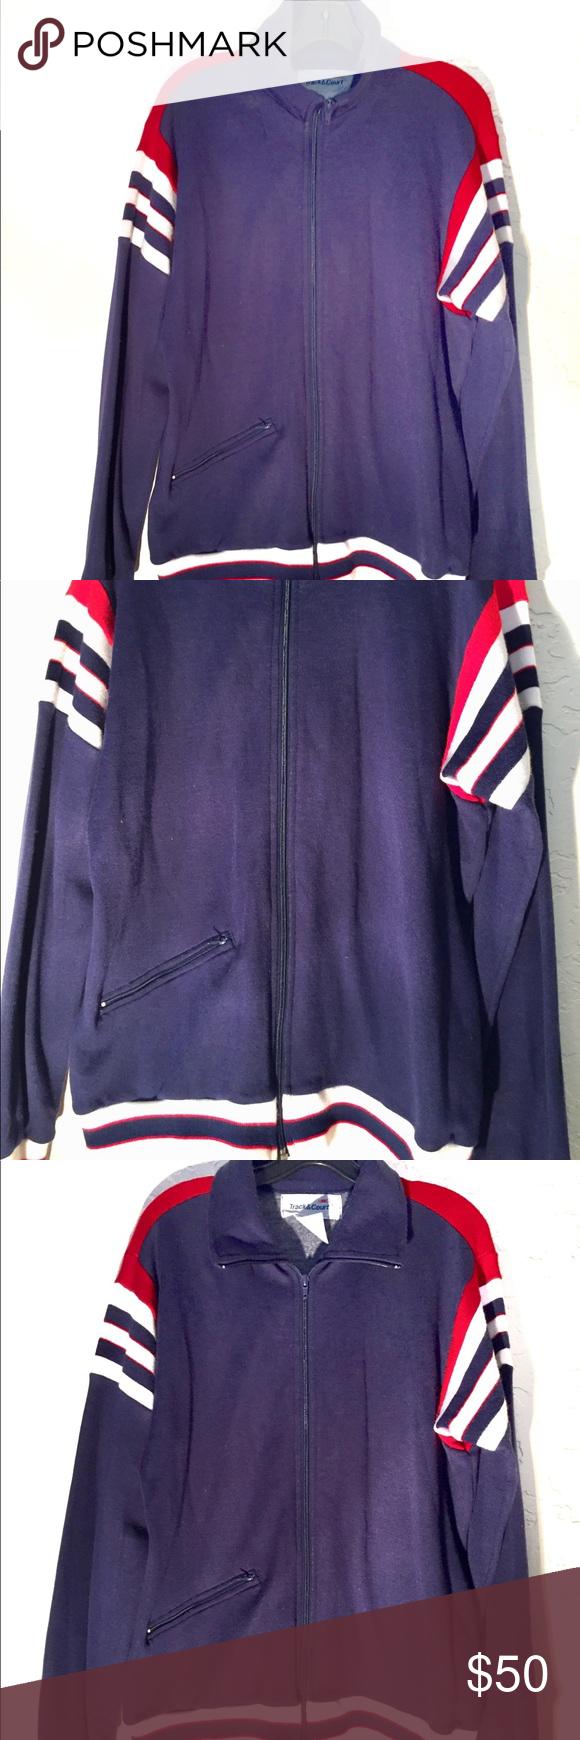 80s Vintage Blue Red White Striped Track Jacket Track Jackets Jackets Striped